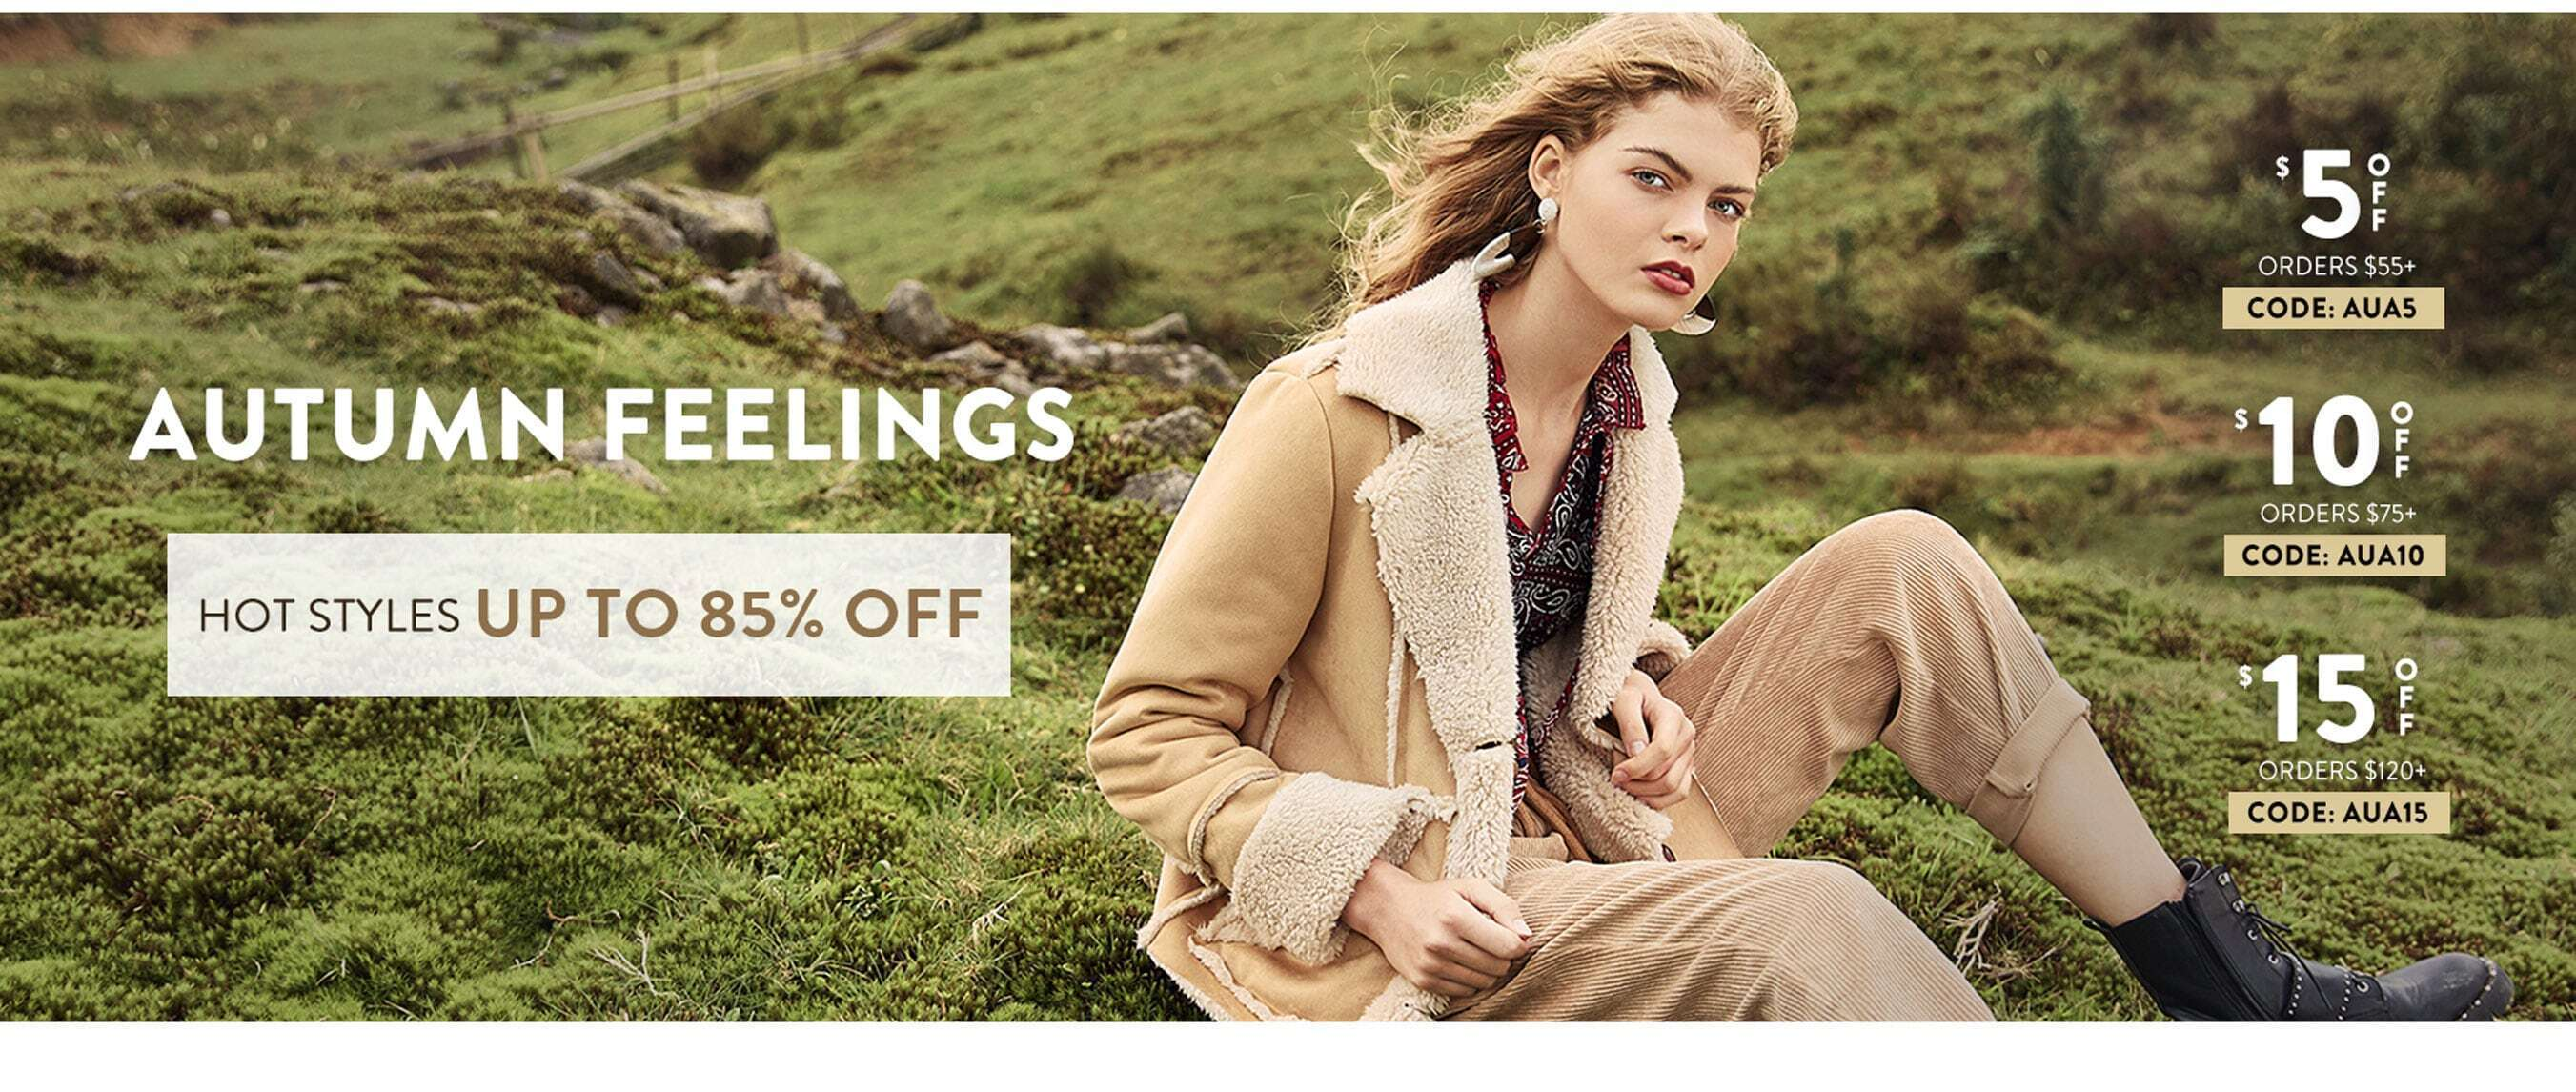 6a14301d000 SHEIN-Fashion Shopping Online 12+